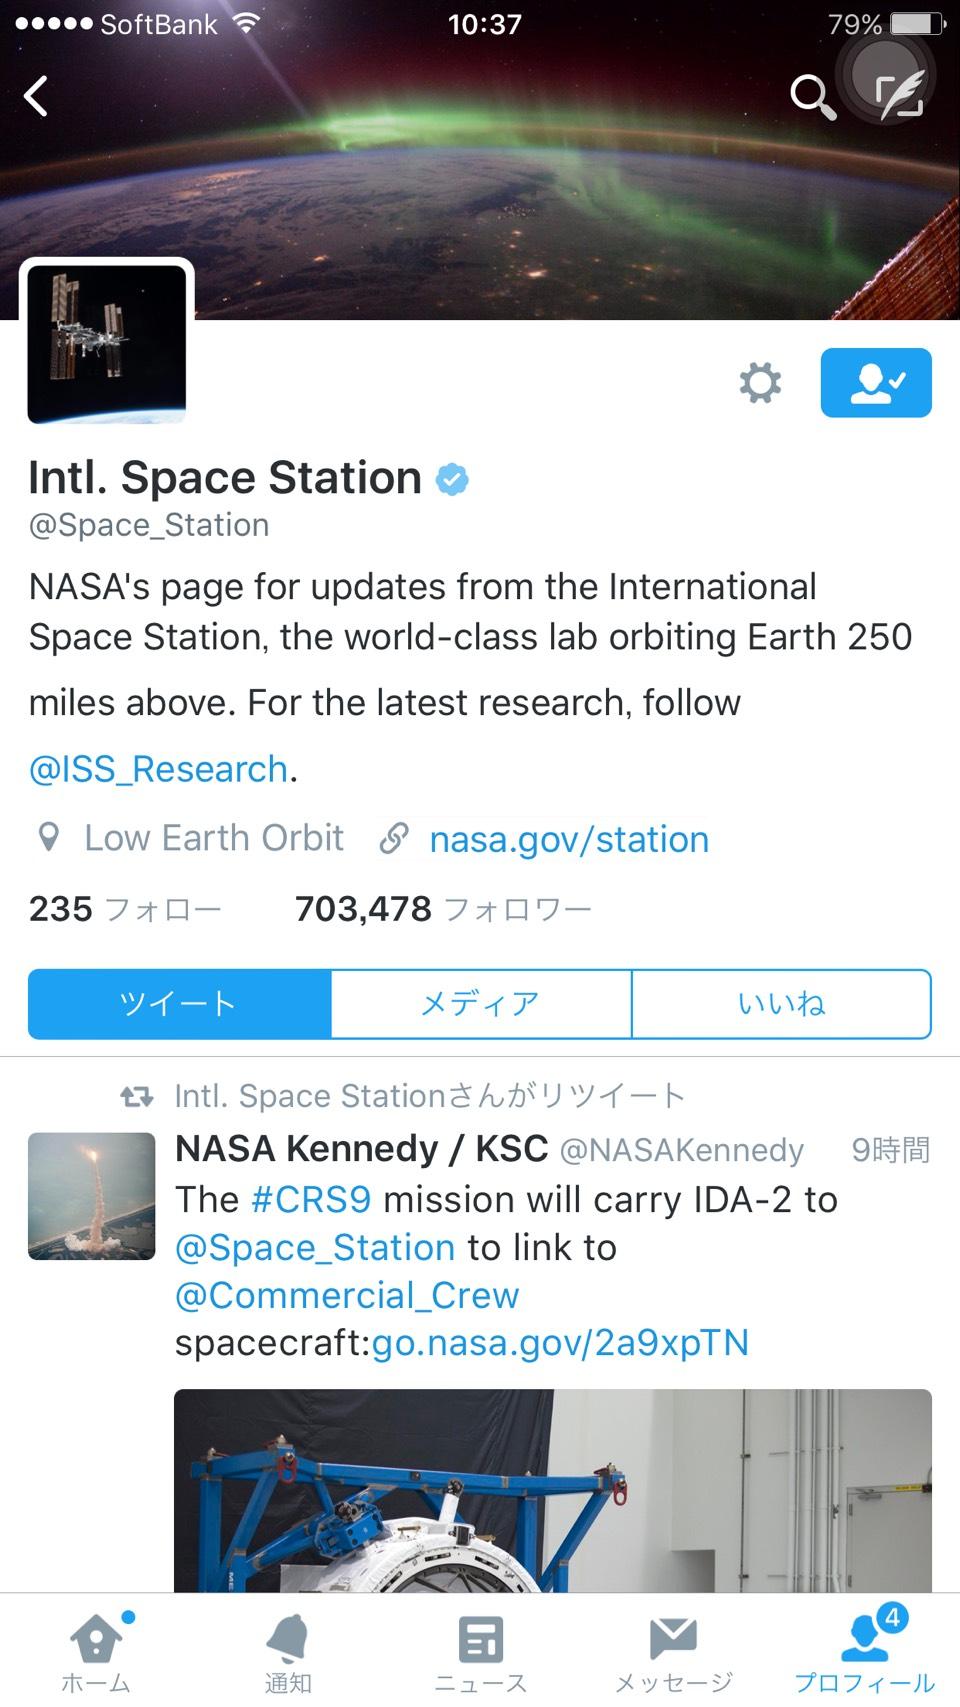 NASAのツイッター